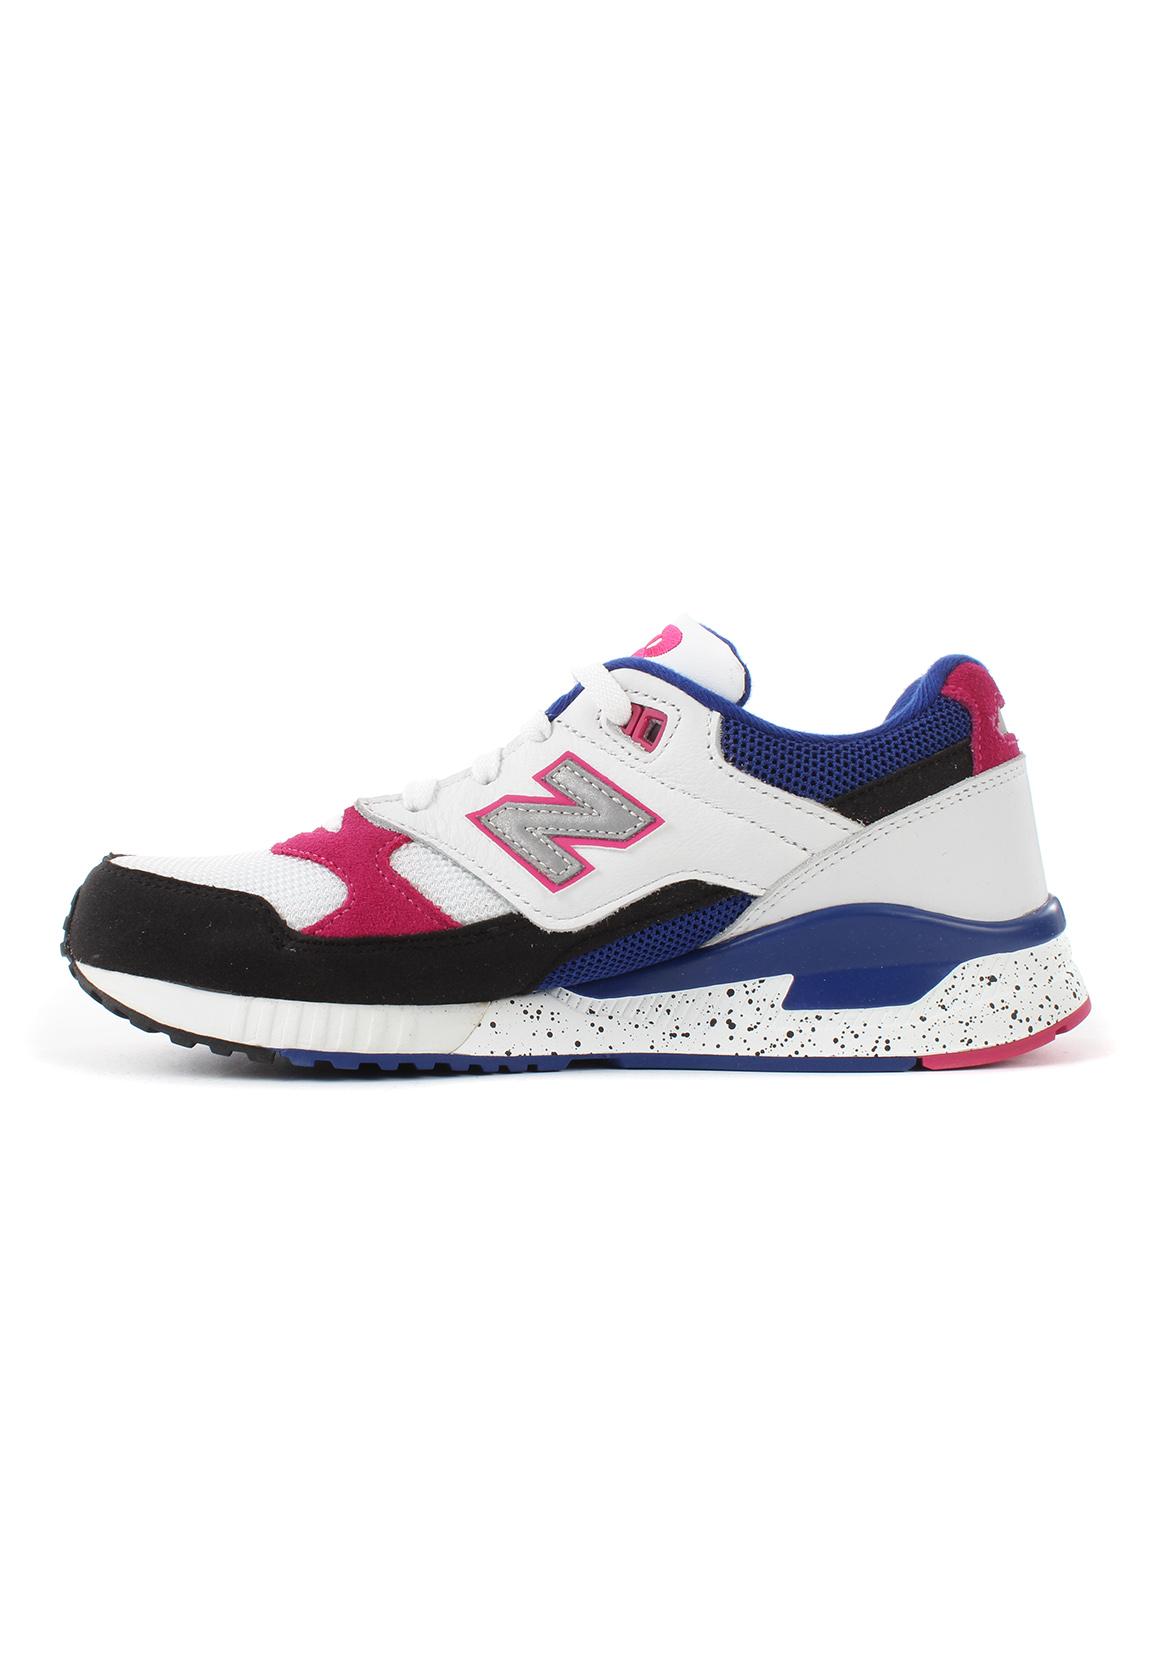 New Balance Damen Sneaker W530PSA Mehrfarbig Weiss Pink Blau